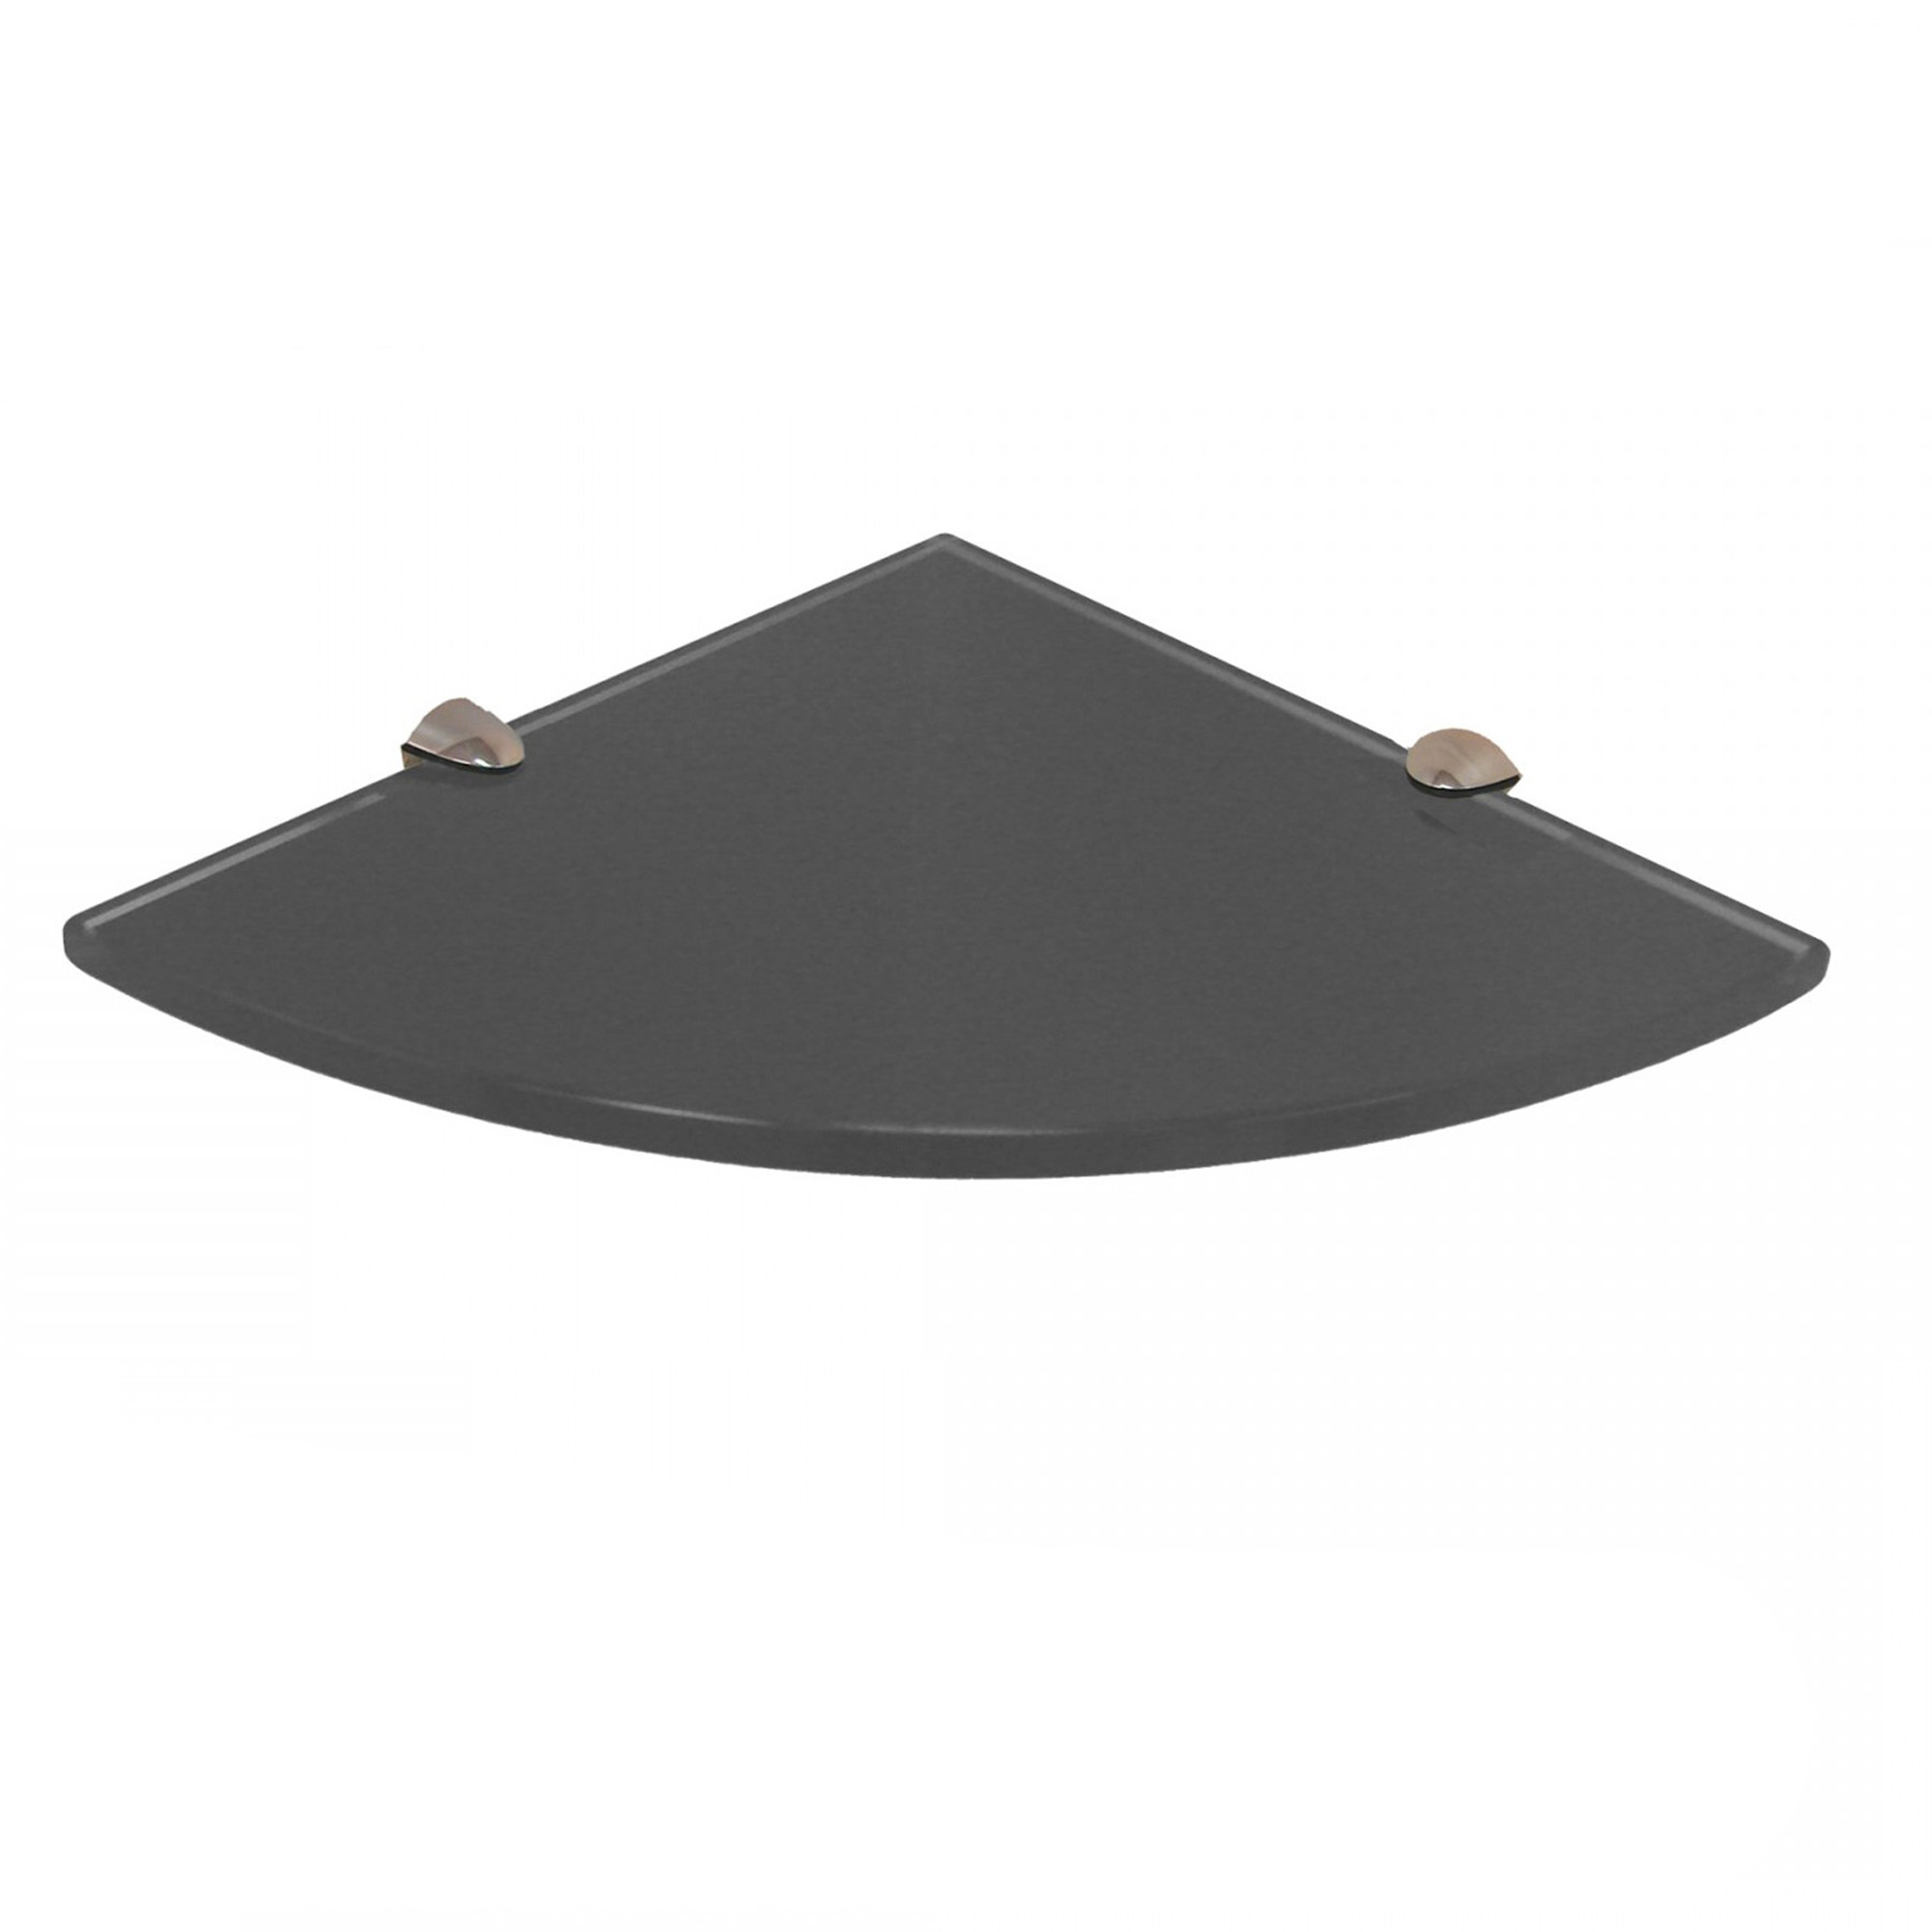 fab glass and mirror quarter circle corner floating grey glass shelf w brackets ebay. Black Bedroom Furniture Sets. Home Design Ideas